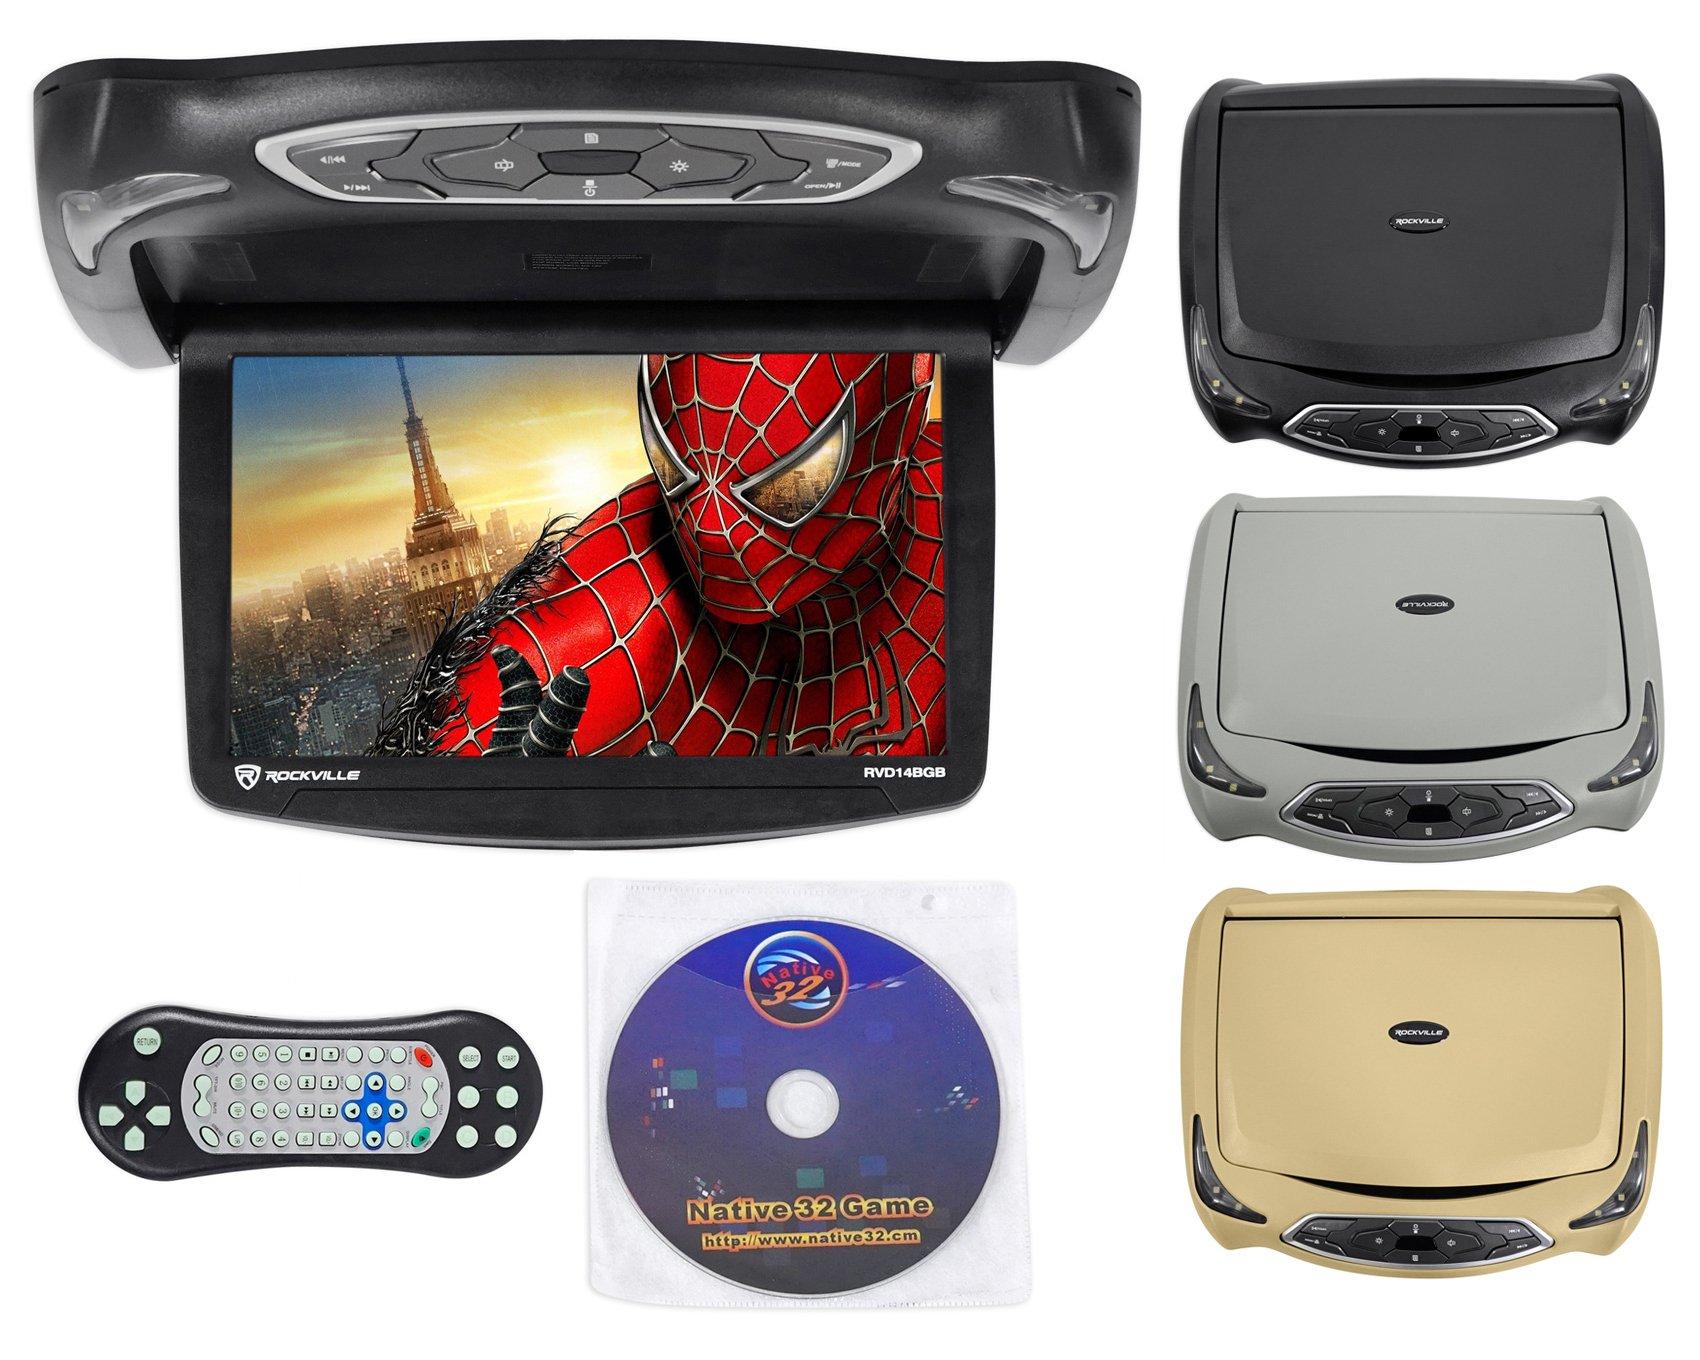 Rockville RVD14BGB Black/Grey/Tan 14'' Flip Down Car Monitor W DVD/HDMI/Games/USB by Rockville